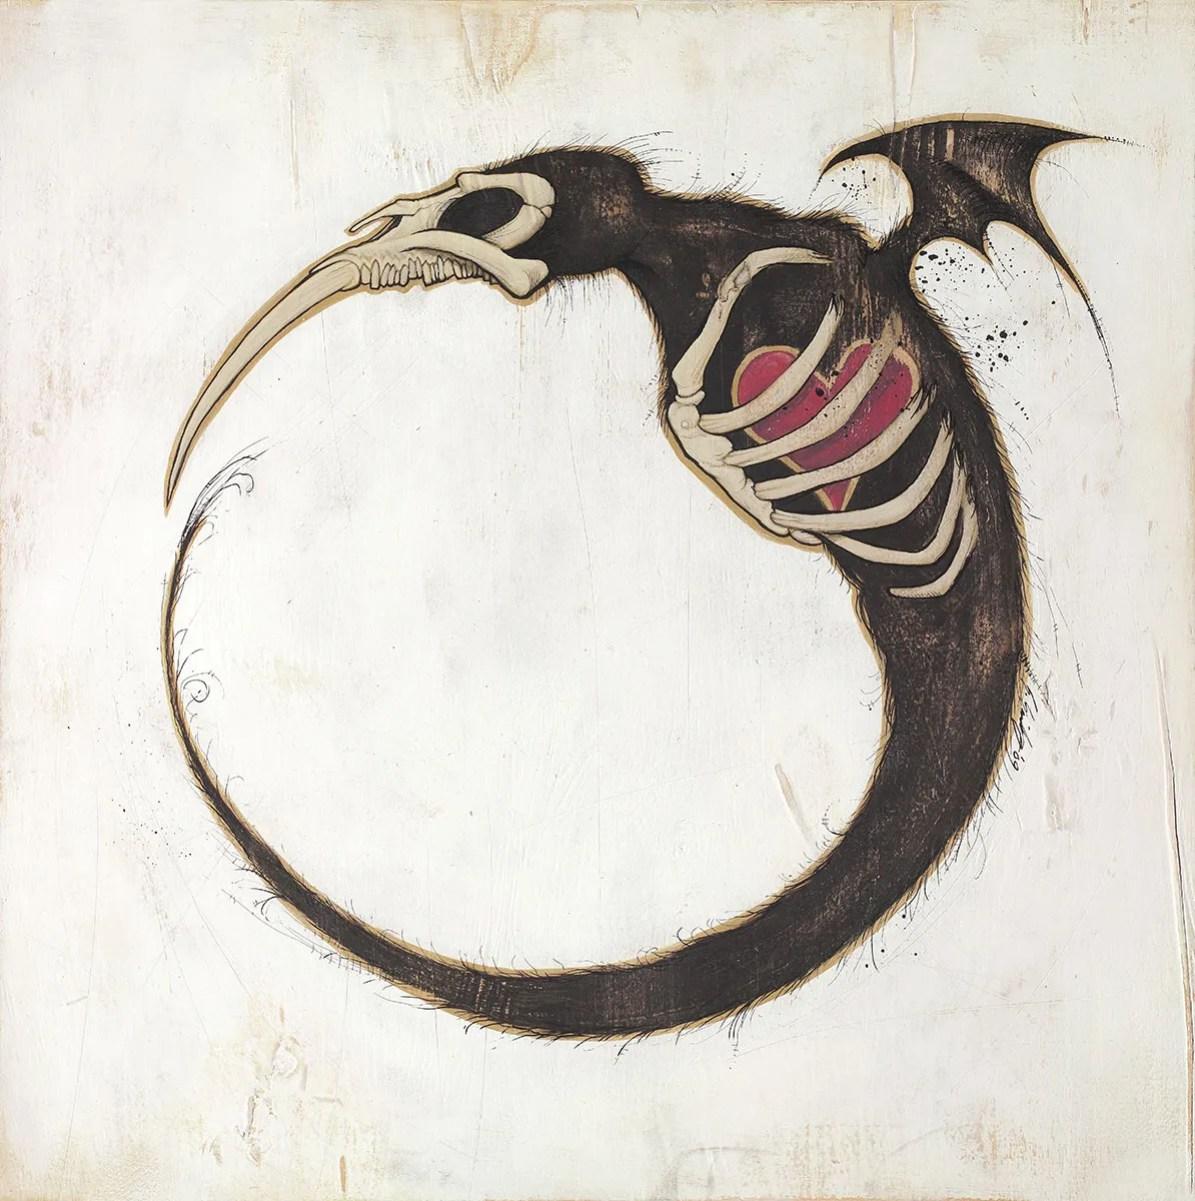 CIRCLE OF LOVE gris grimly vampire the moog